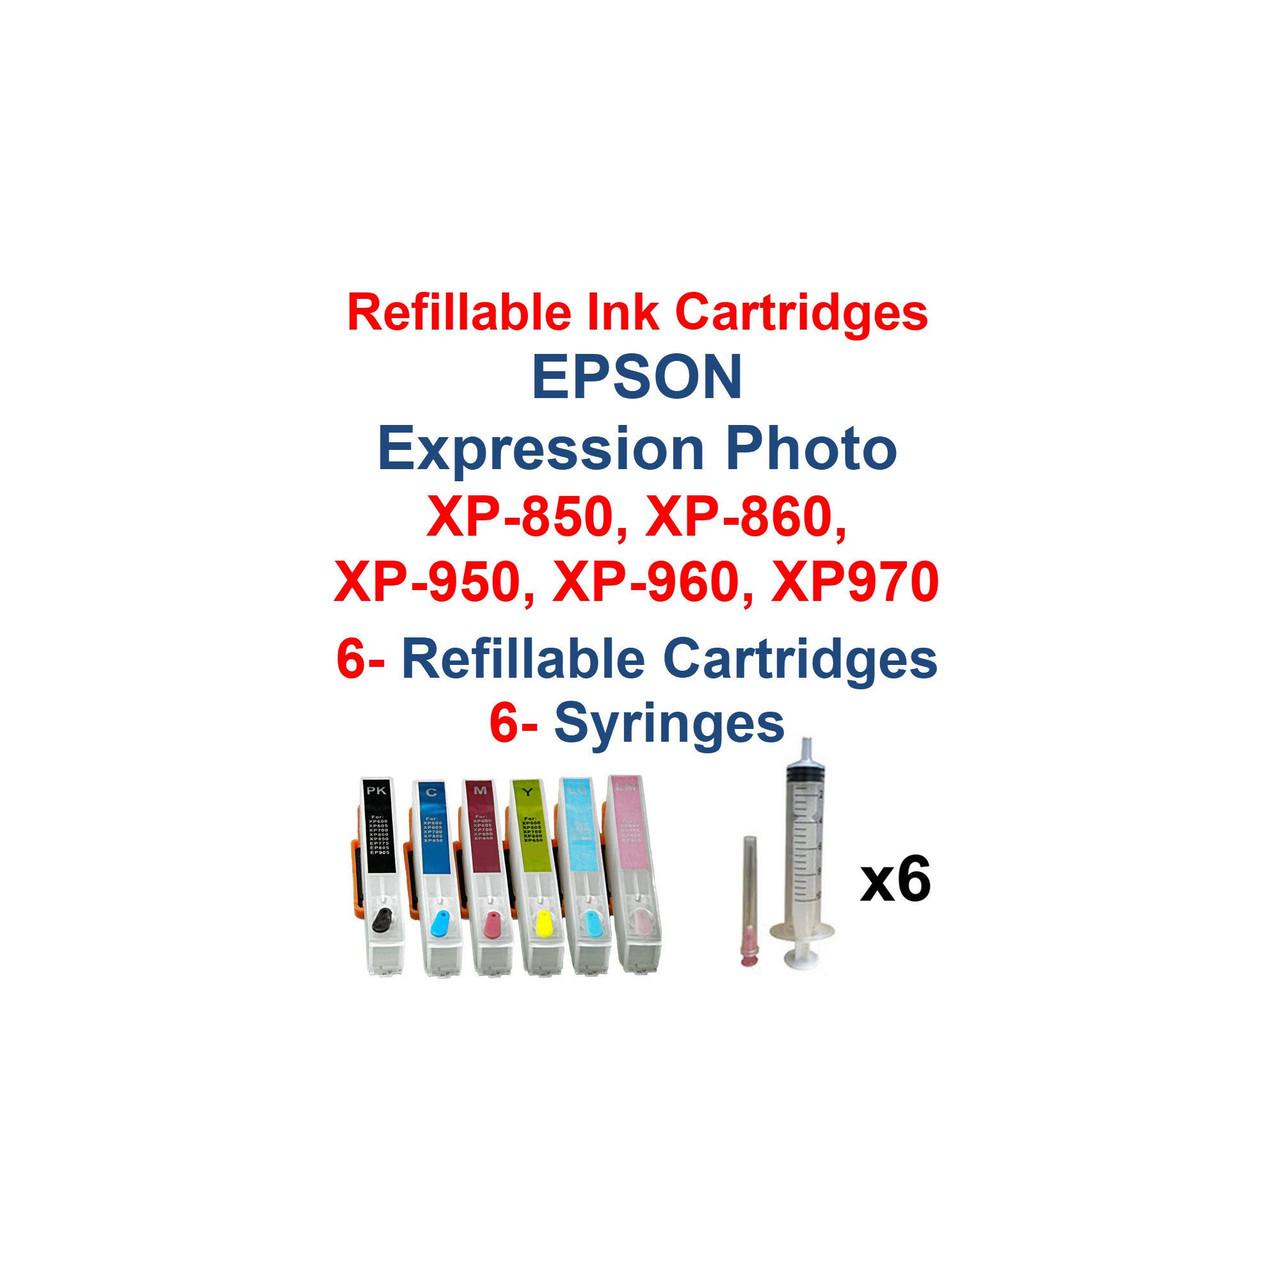 Refillable ink Cartridges for Epson Expression Photo xp-850 xp-860 xp-950 xp-960 xp-970 Printer